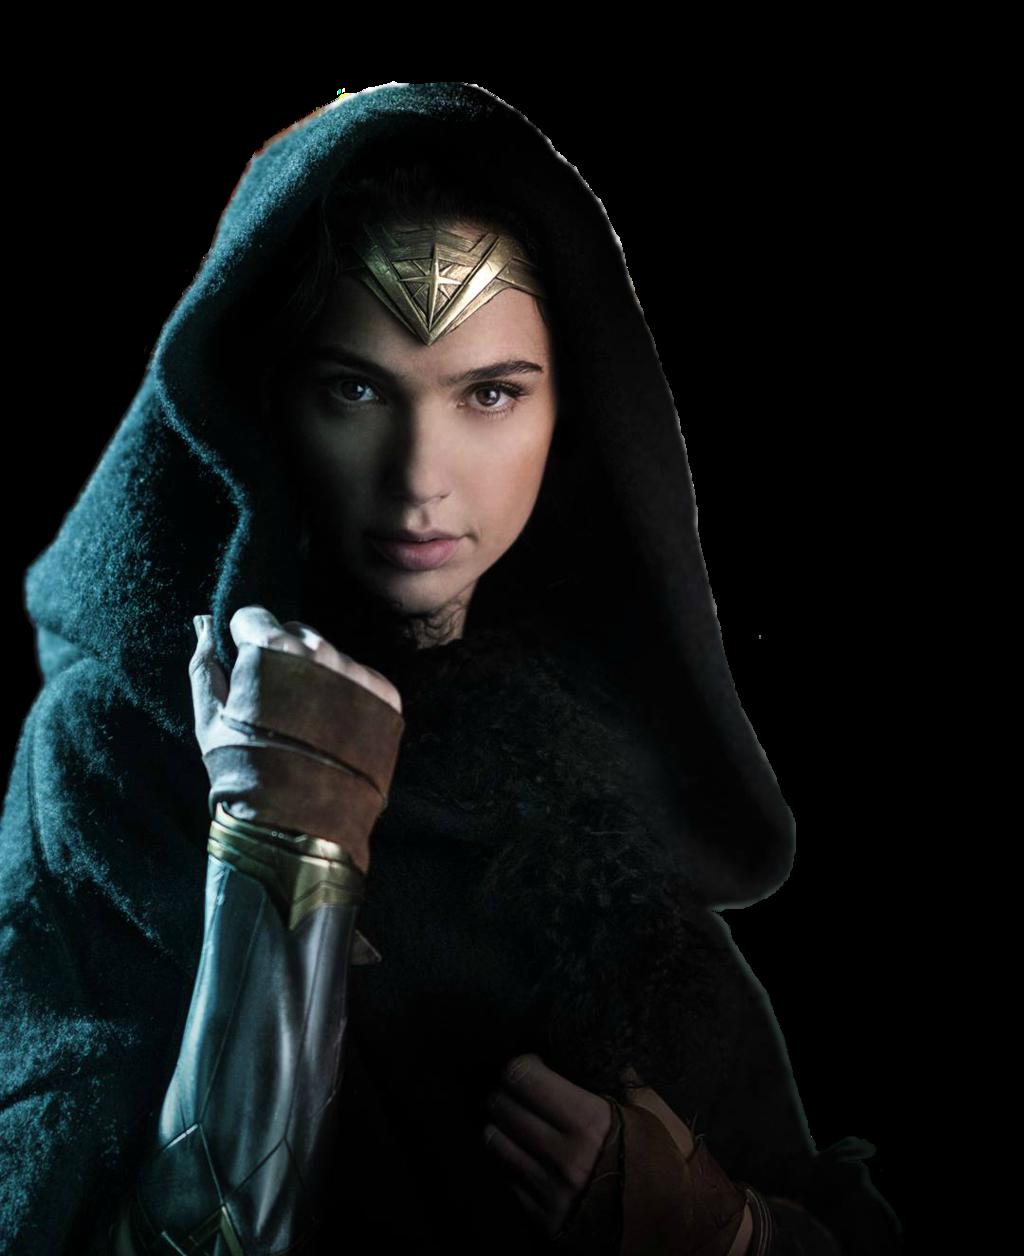 . PlusPng.com Wonder Woman - Gal Gadot (png) by saywonderland - Gal Gadot PNG